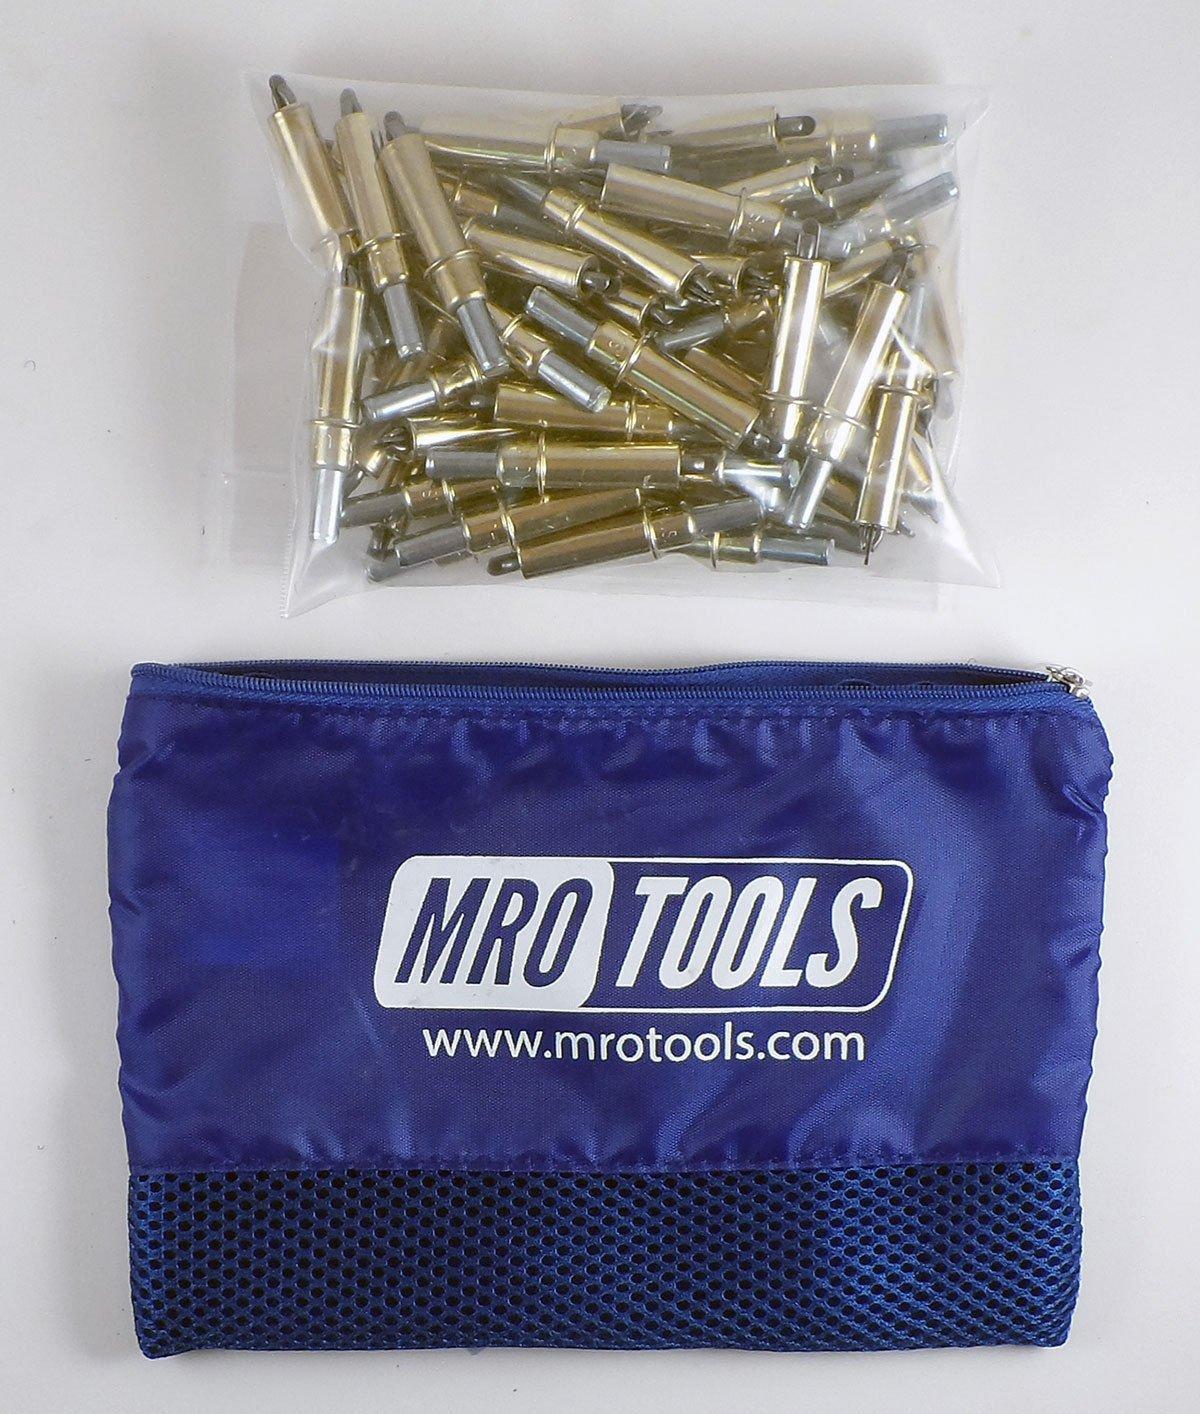 50 3/16 Cleco Sheet Metal Fasteners w/ Mesh Carry Bag (K2S50-3/16)